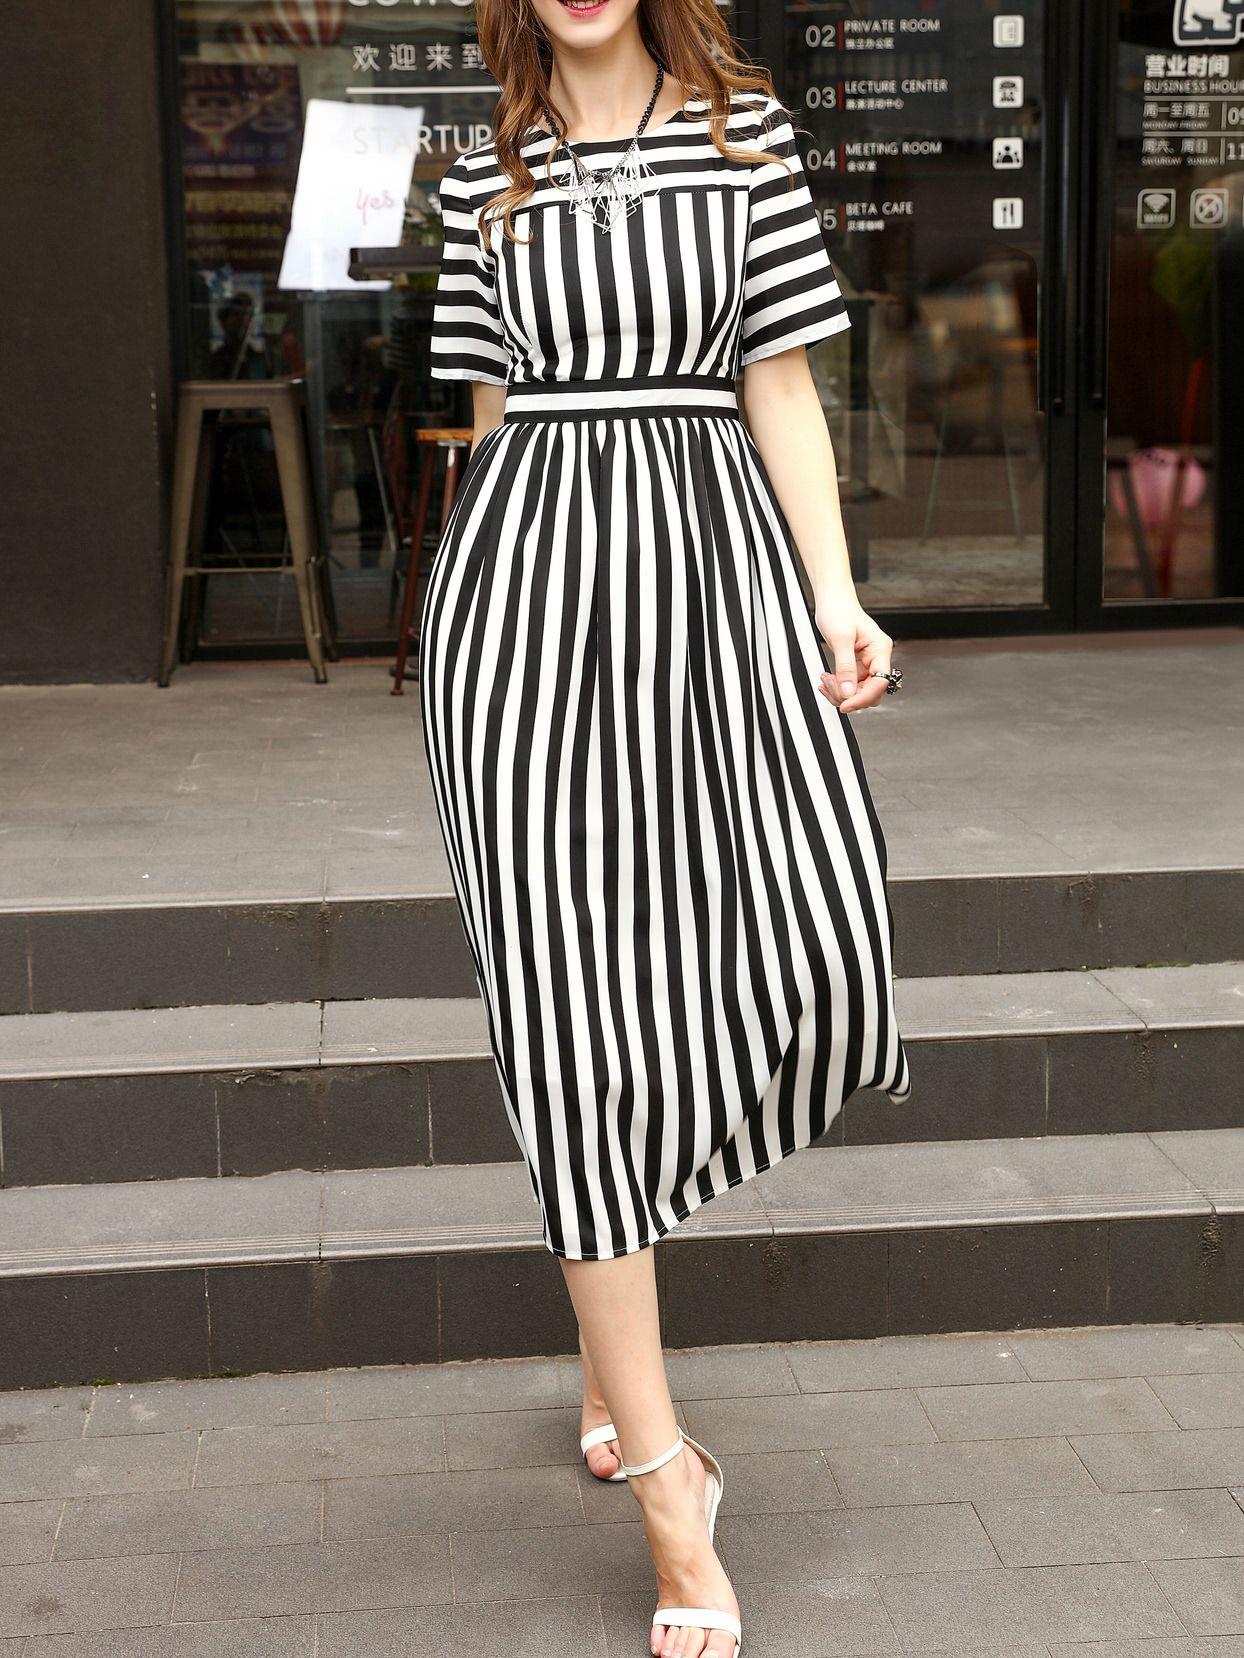 White And Black Striped A Line Dress Shein Sheinside A Line Dress Fashion Striped Casual Dresses [ 1658 x 1244 Pixel ]